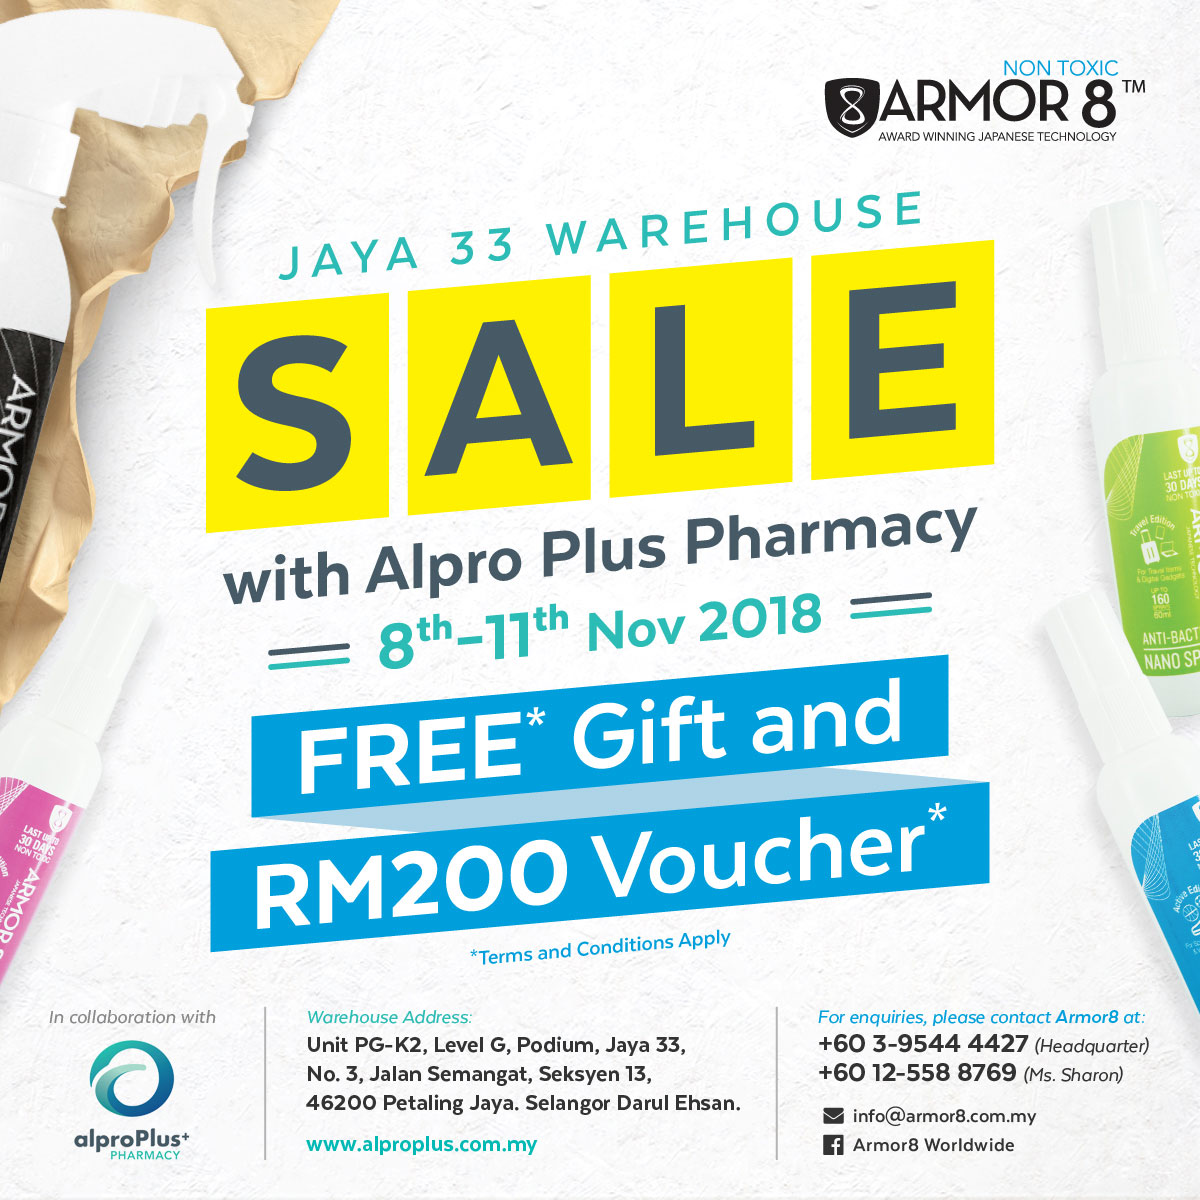 Armor8 Jaya 33 Warehouse Sale with Alpro Plus Facebook Post Design 04